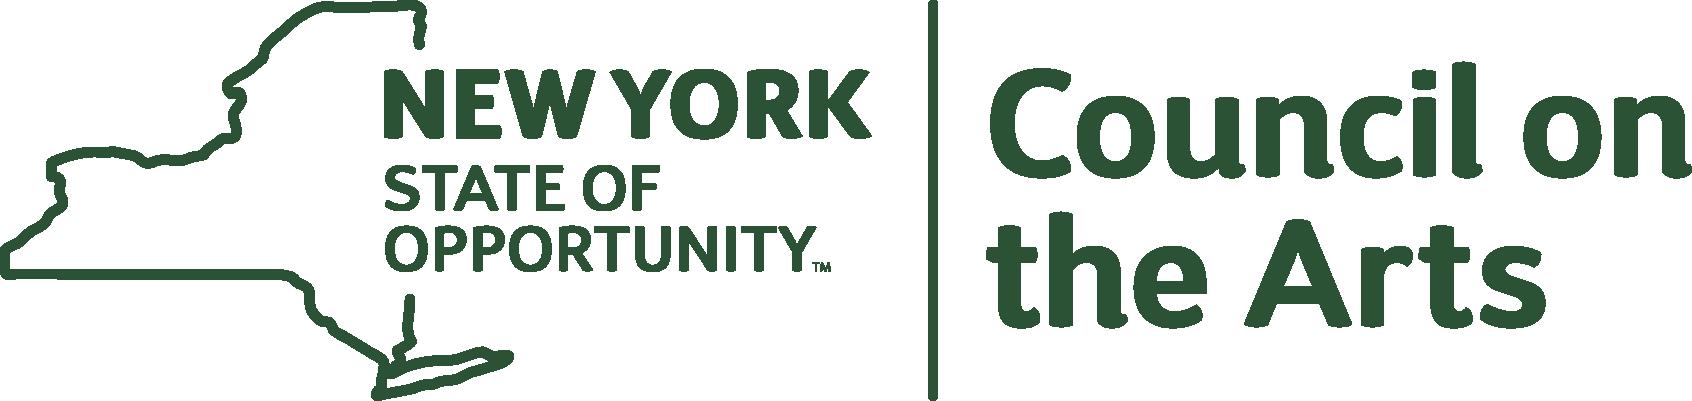 NYSCALogoGreen.png